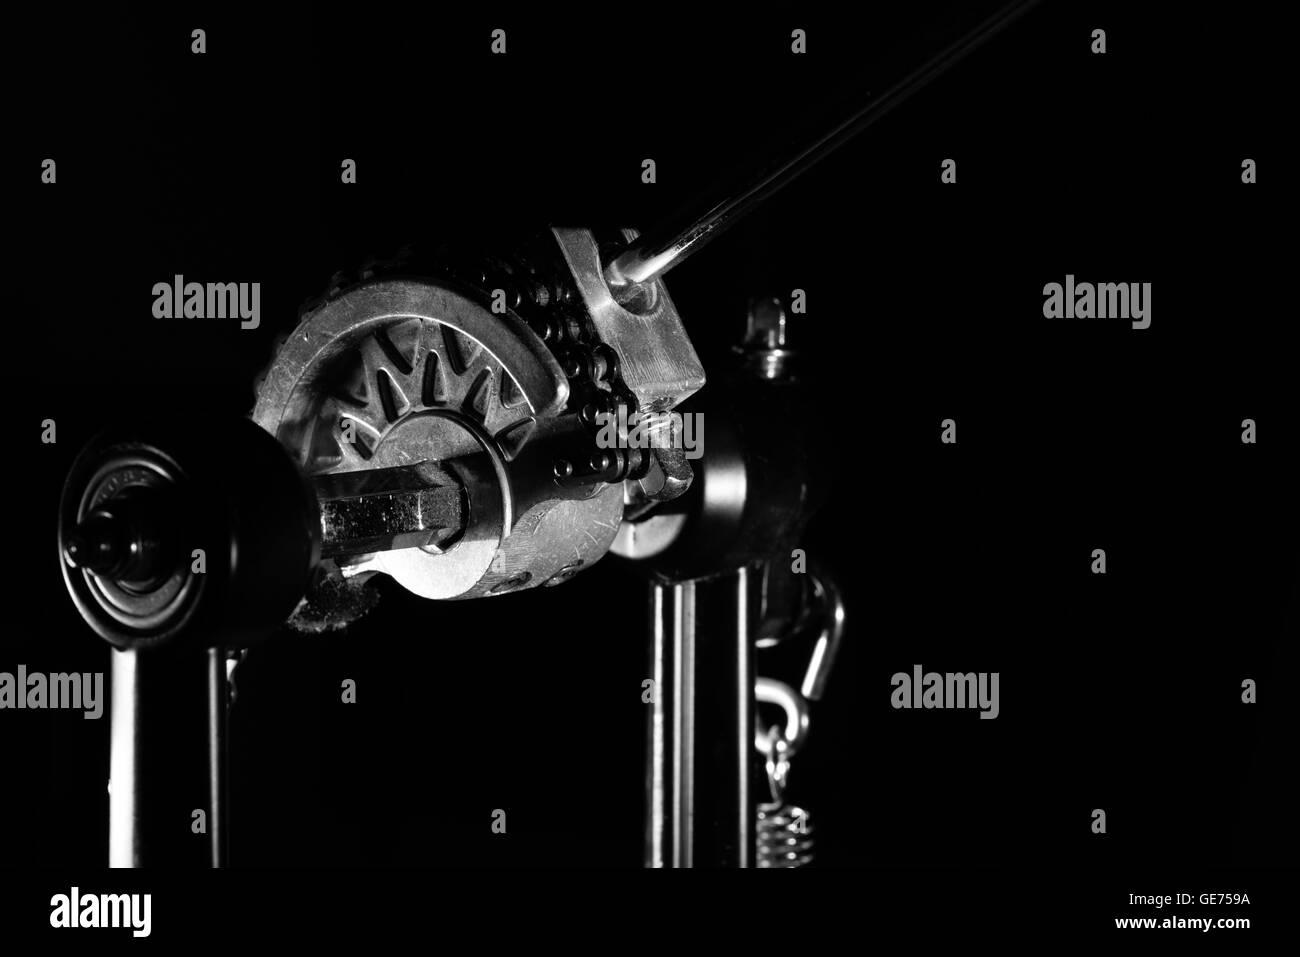 Drum Pedal Mechanism close up - Stock Image